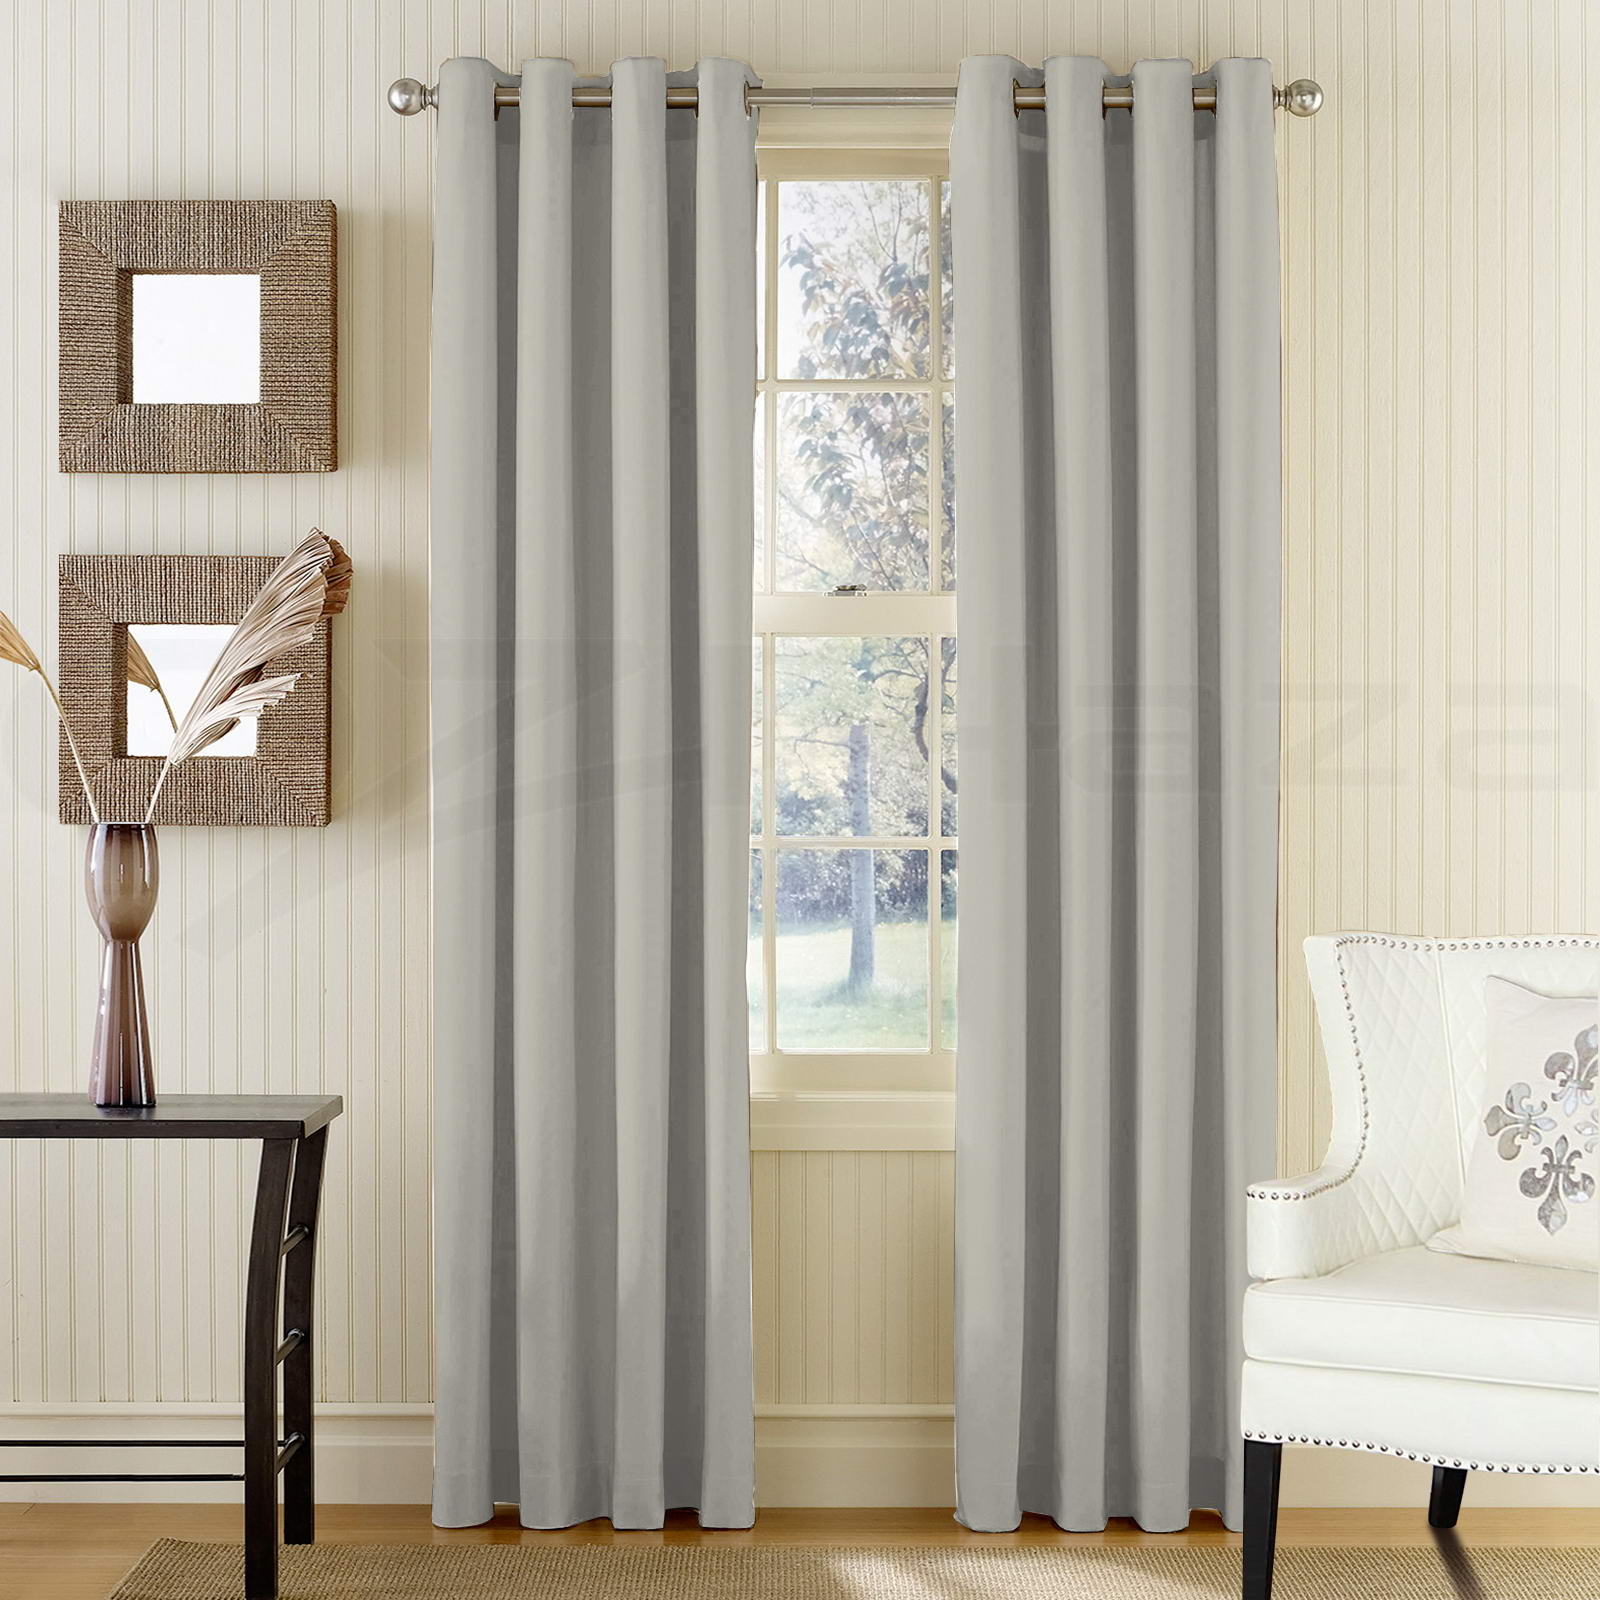 300cmx230cm Blockout Curtains Eyelet Blackout Room